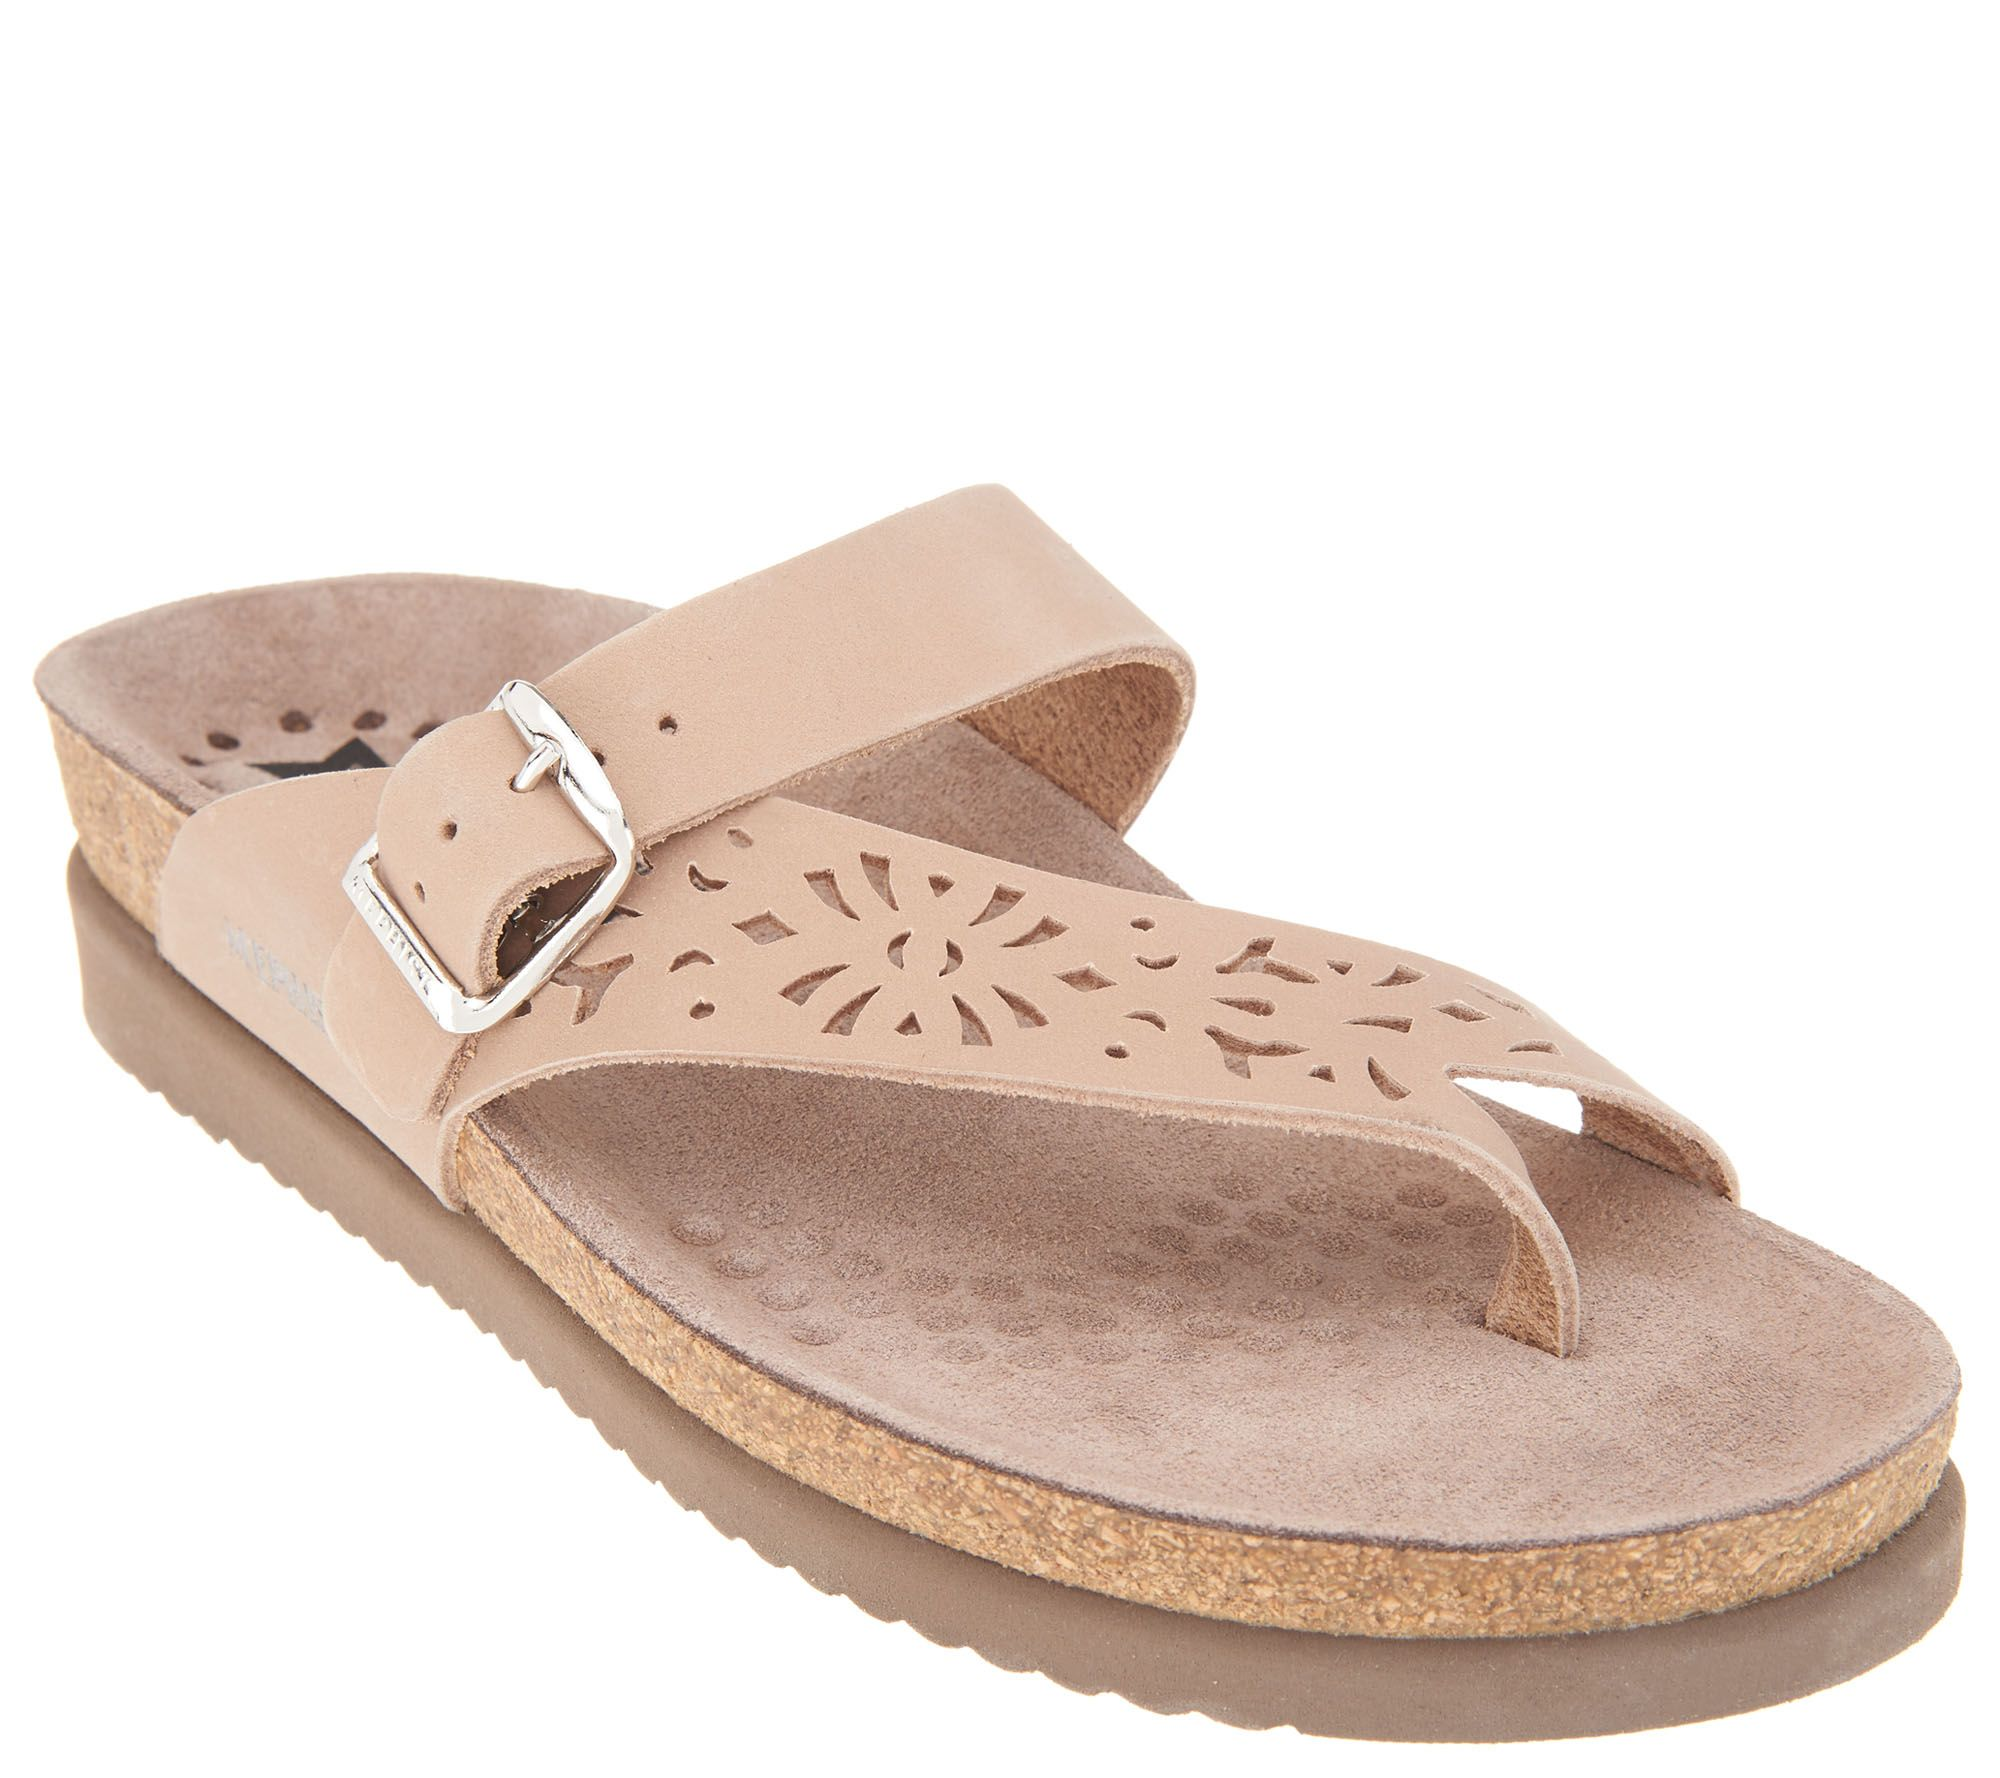 Mephisto Perforated Nubuck Toe Loop Sandals - Helen Perf free shipping shop for 1Ng5ZVnApA